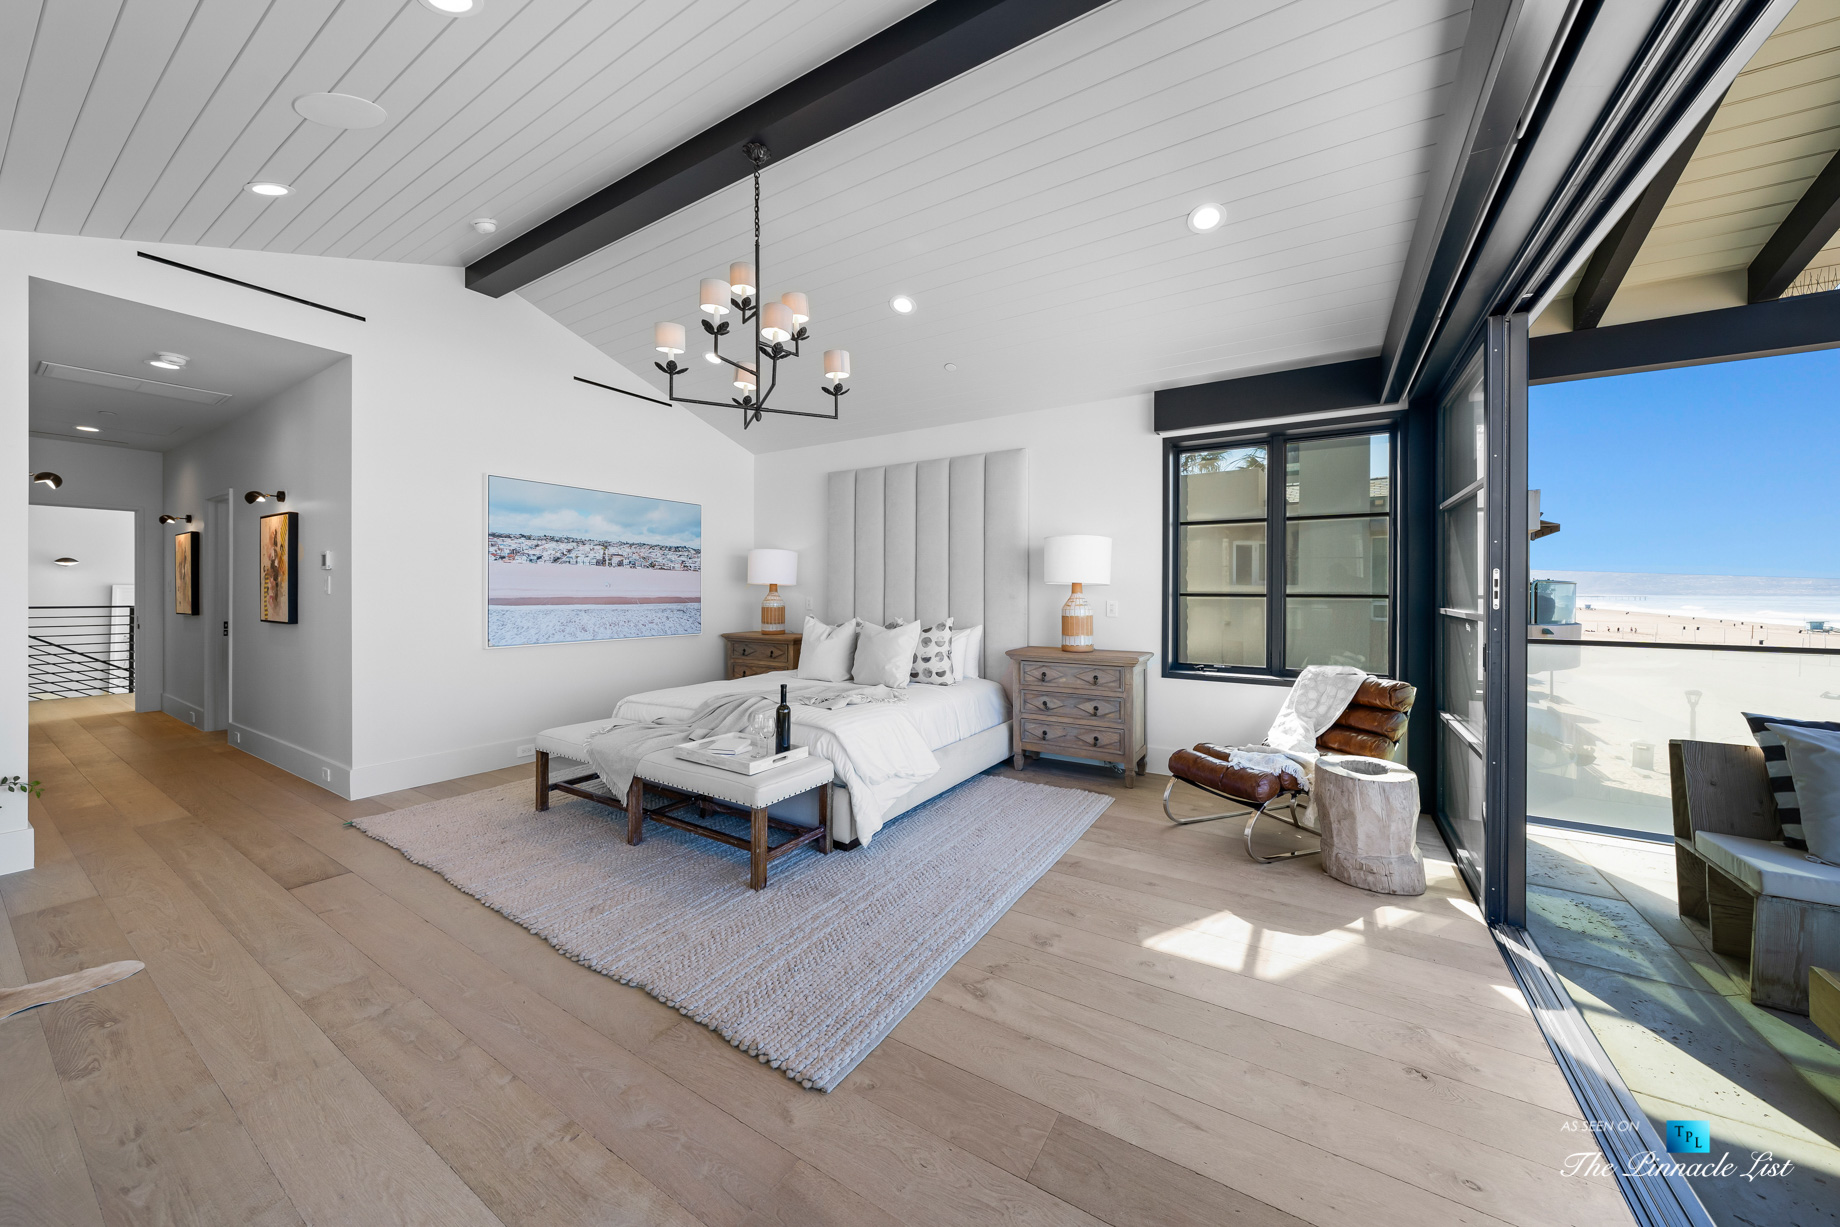 508 The Strand, Manhattan Beach, CA, USA – Master Bedroom Beach View – Luxury Real Estate – Oceanfront Home